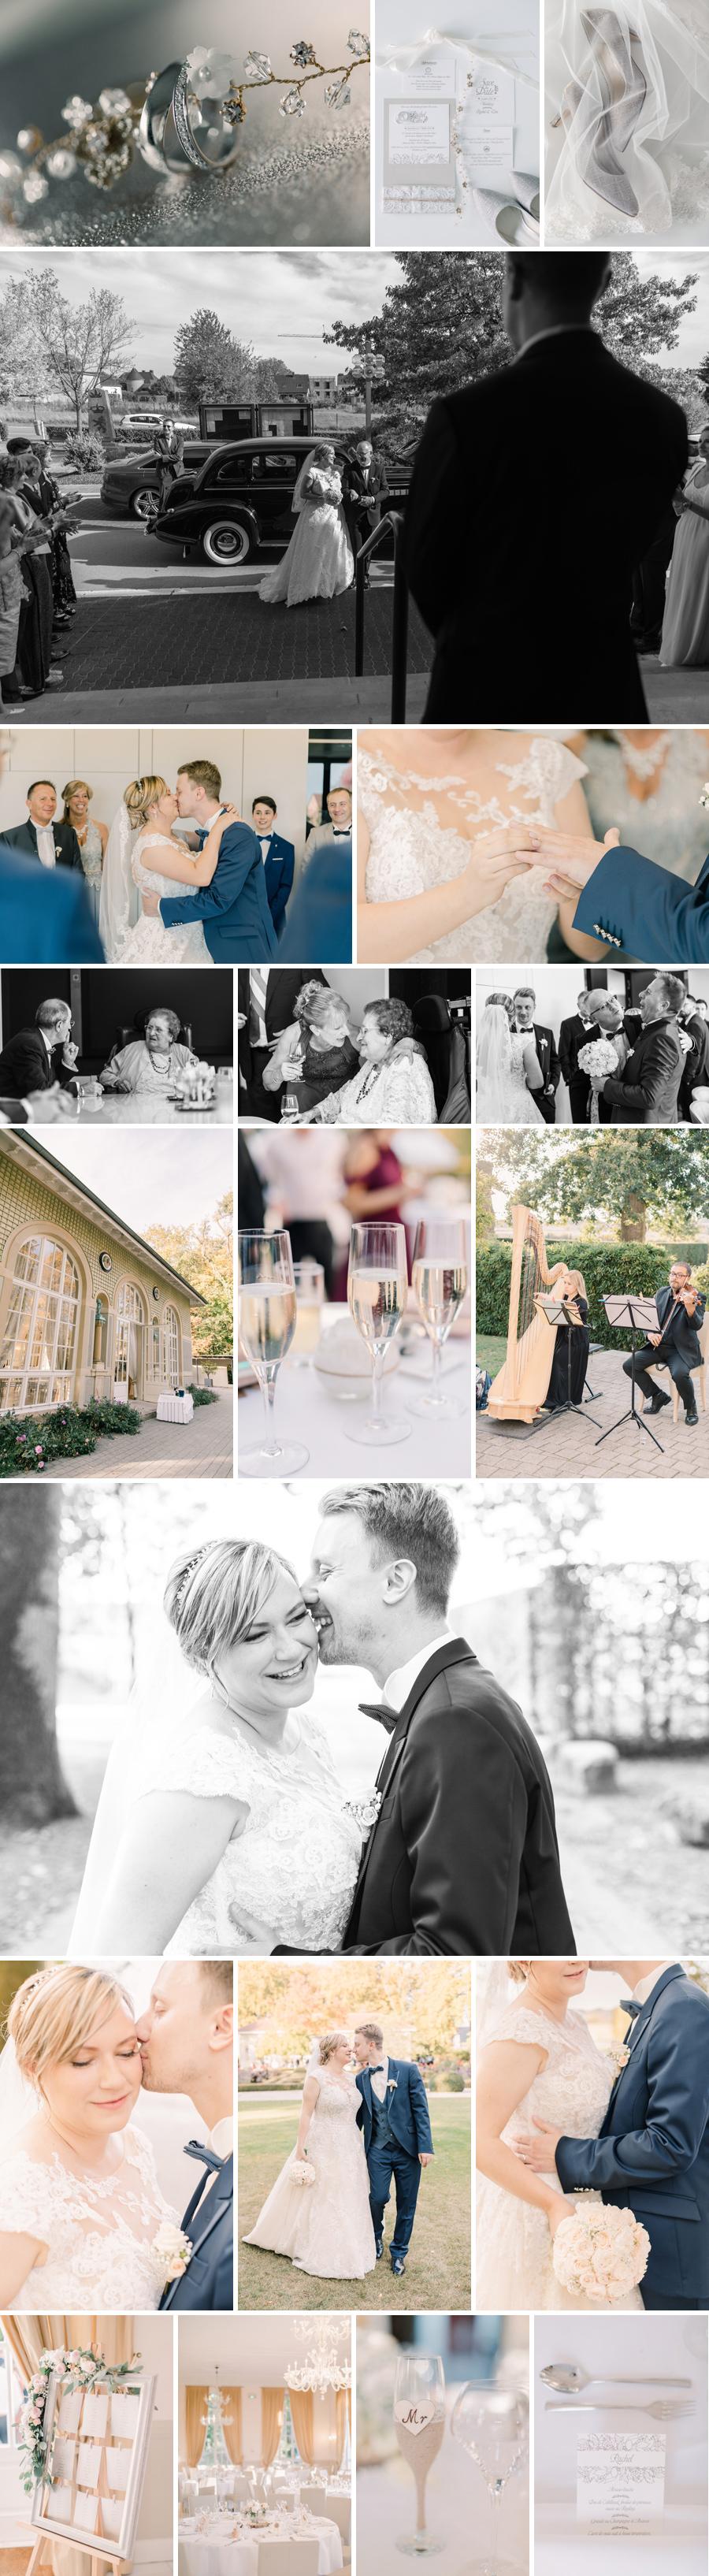 mariage orangerie mondorff luxembourg photographe